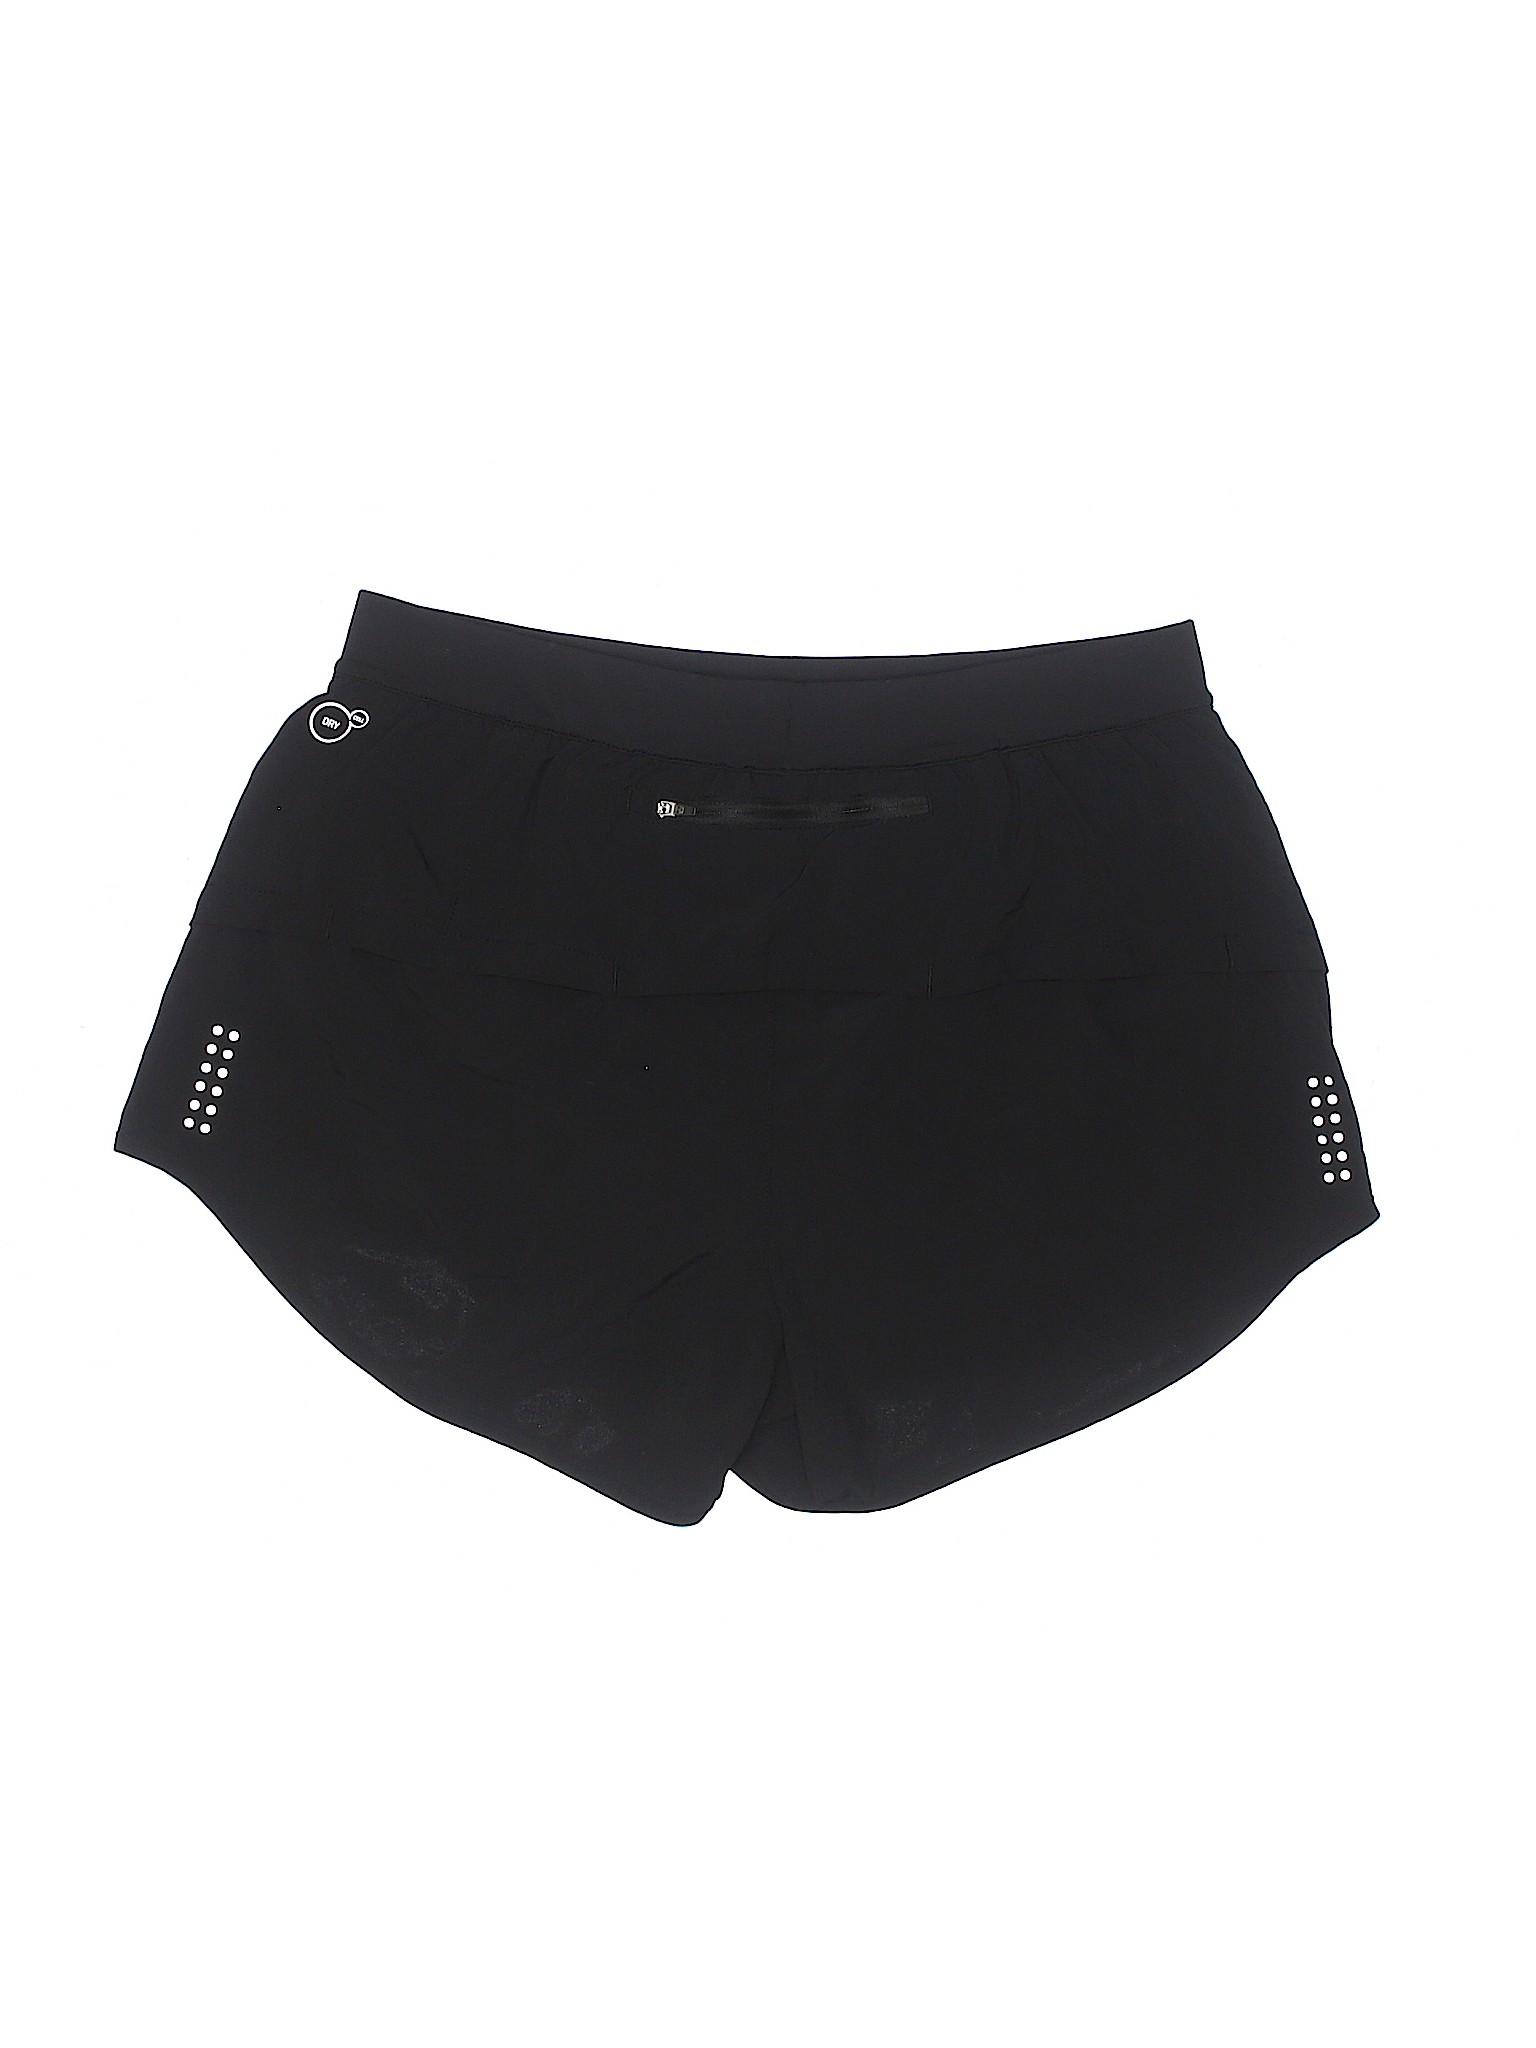 Puma Athletic Boutique Shorts Leisure Boutique Leisure YwgF1g